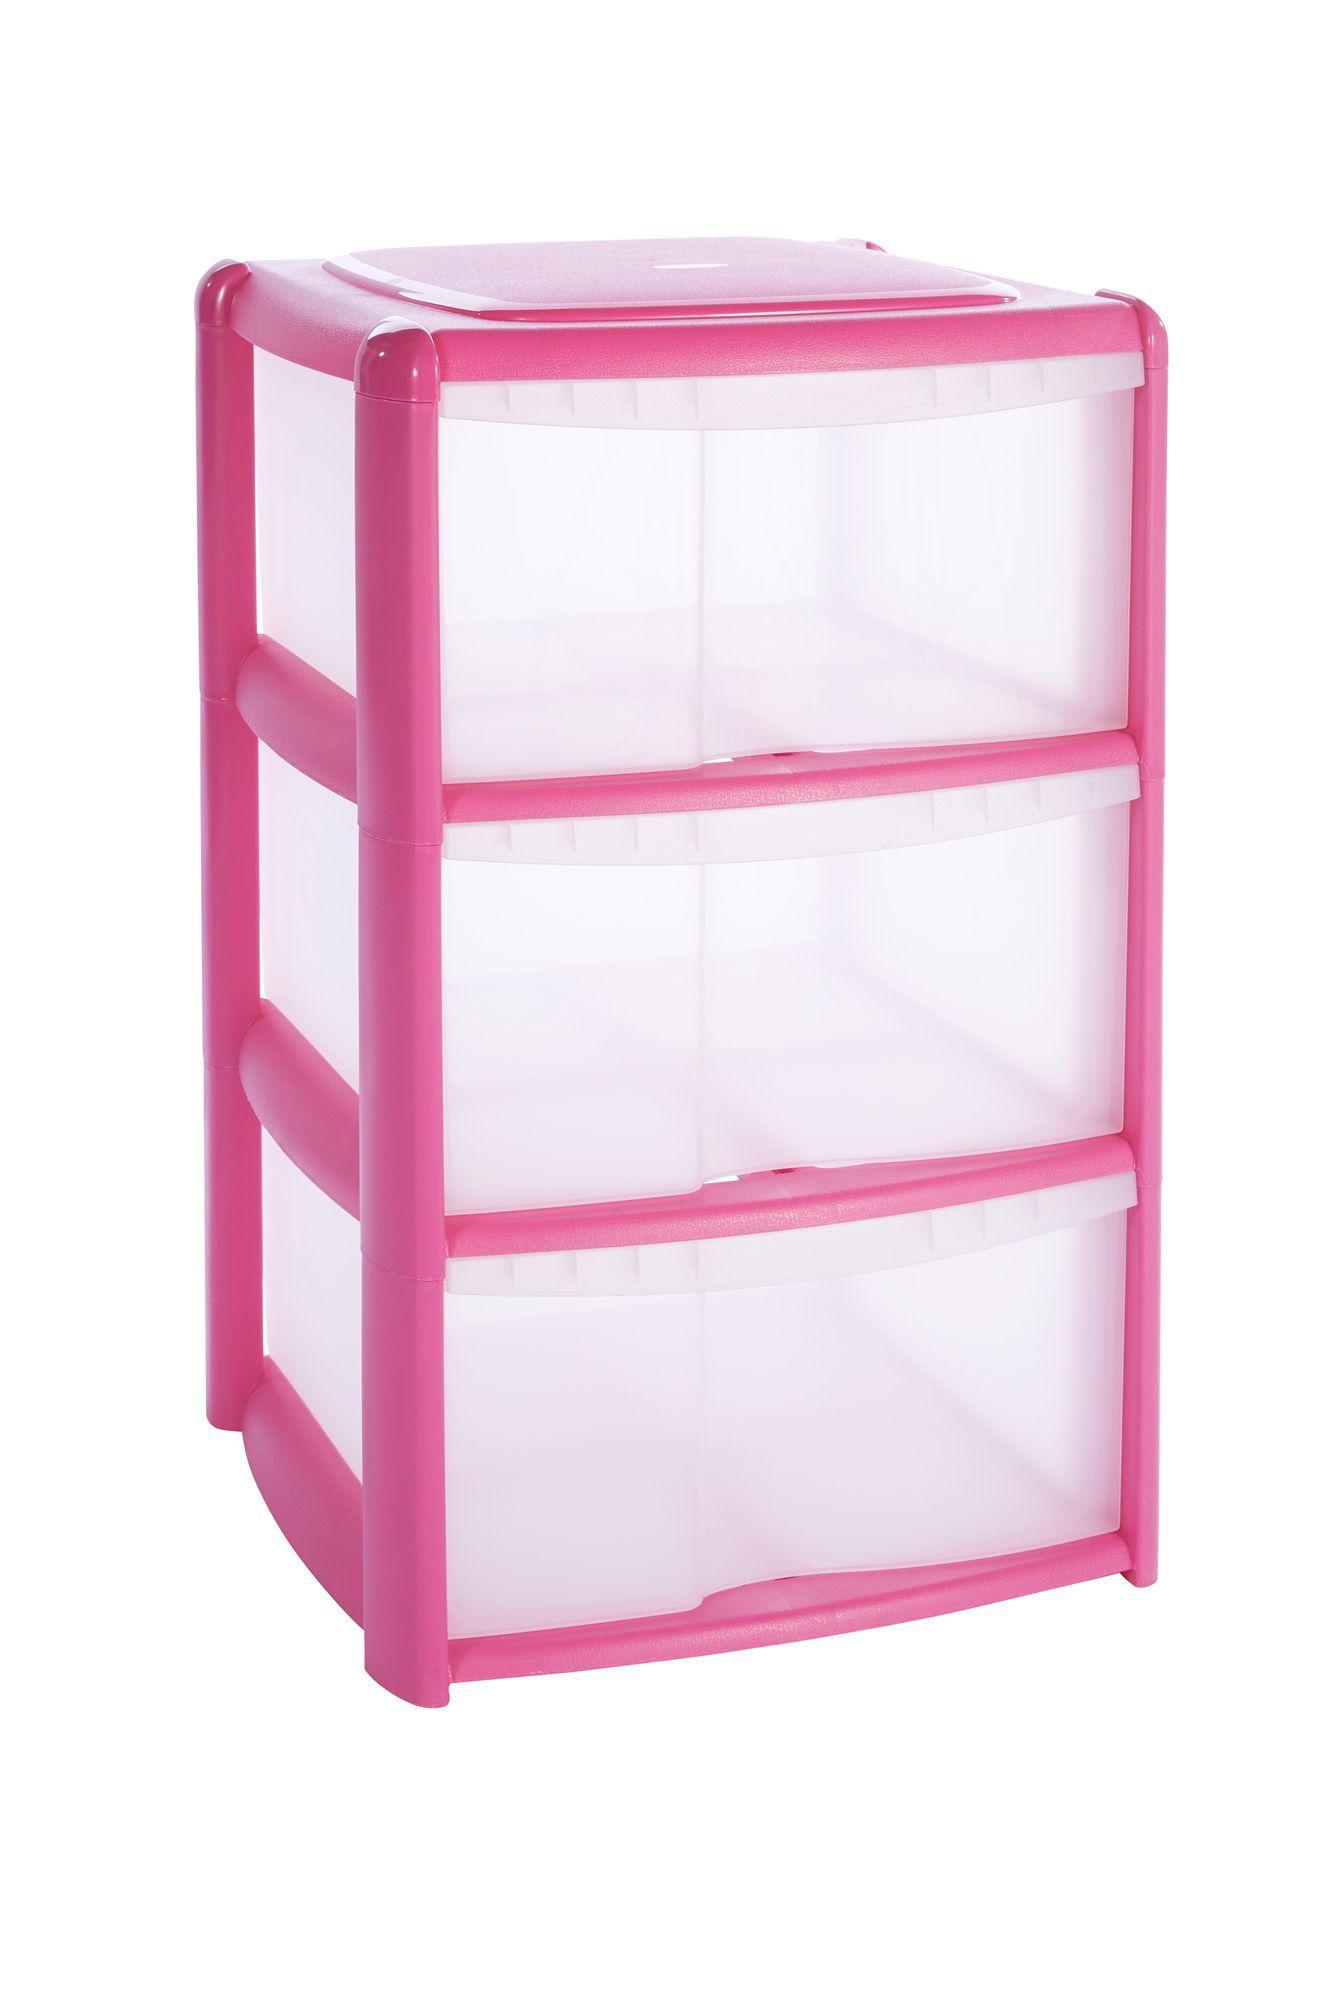 B&q Pink Plastic Drawer Tower Unit